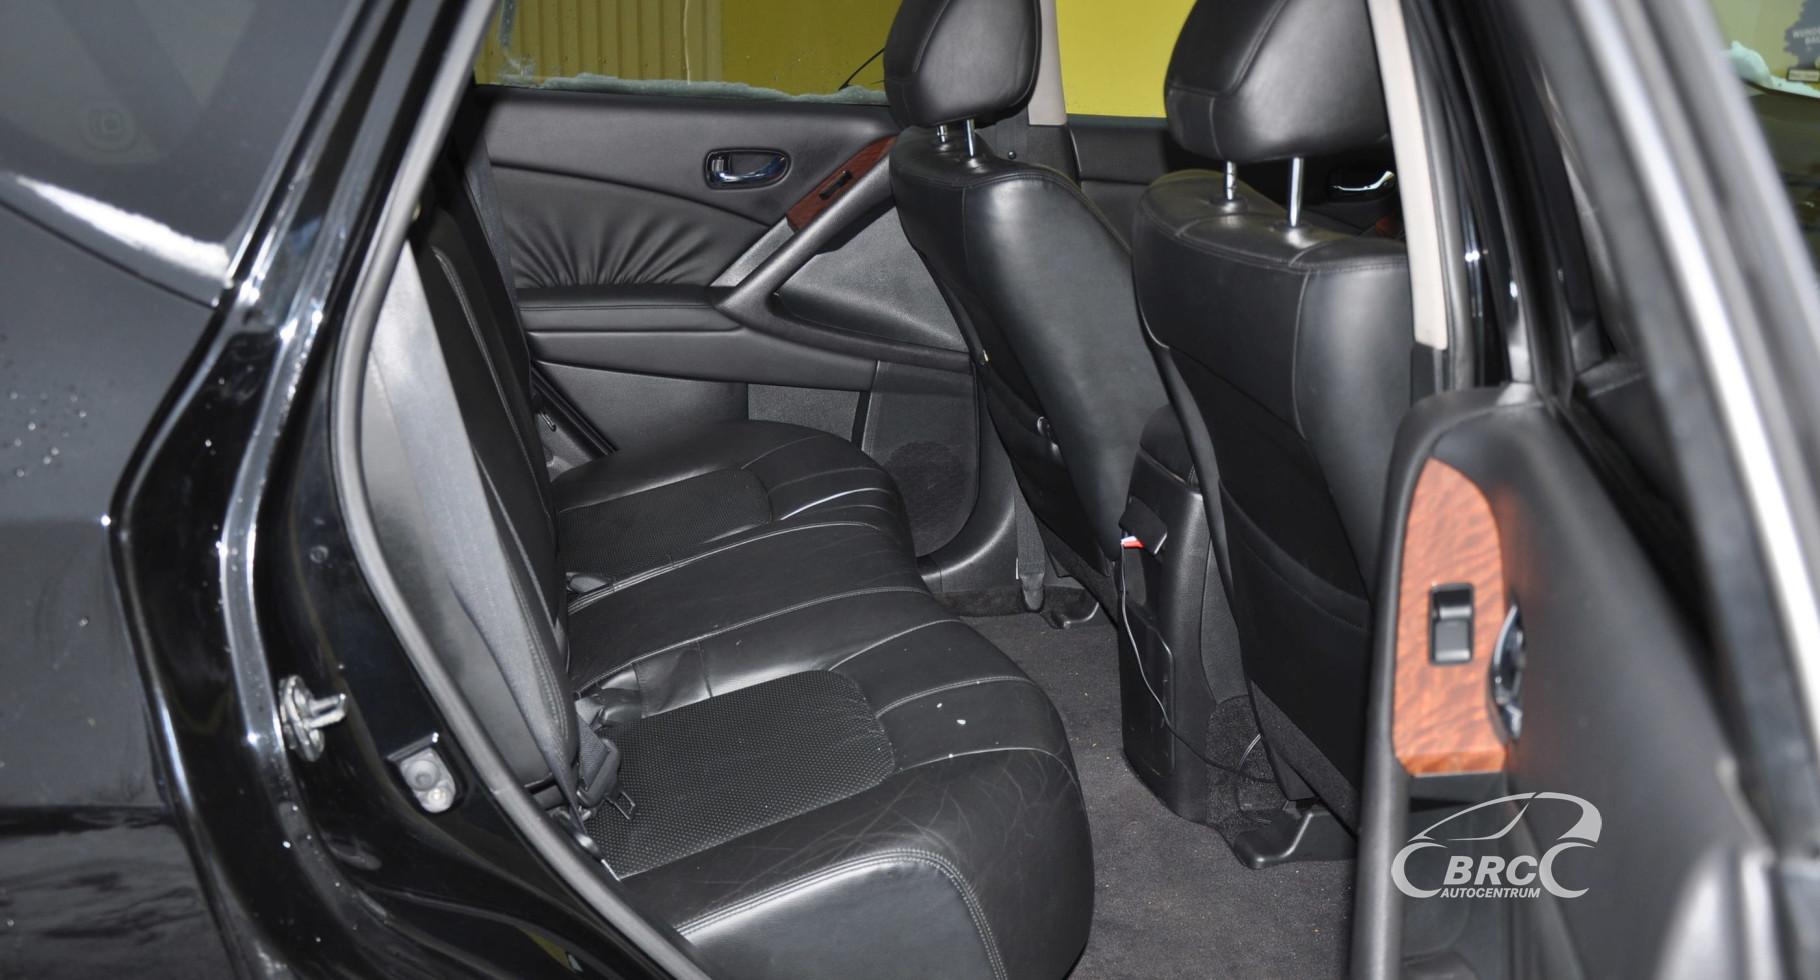 Nissan Murano 3.5 V6 4WD Automatas